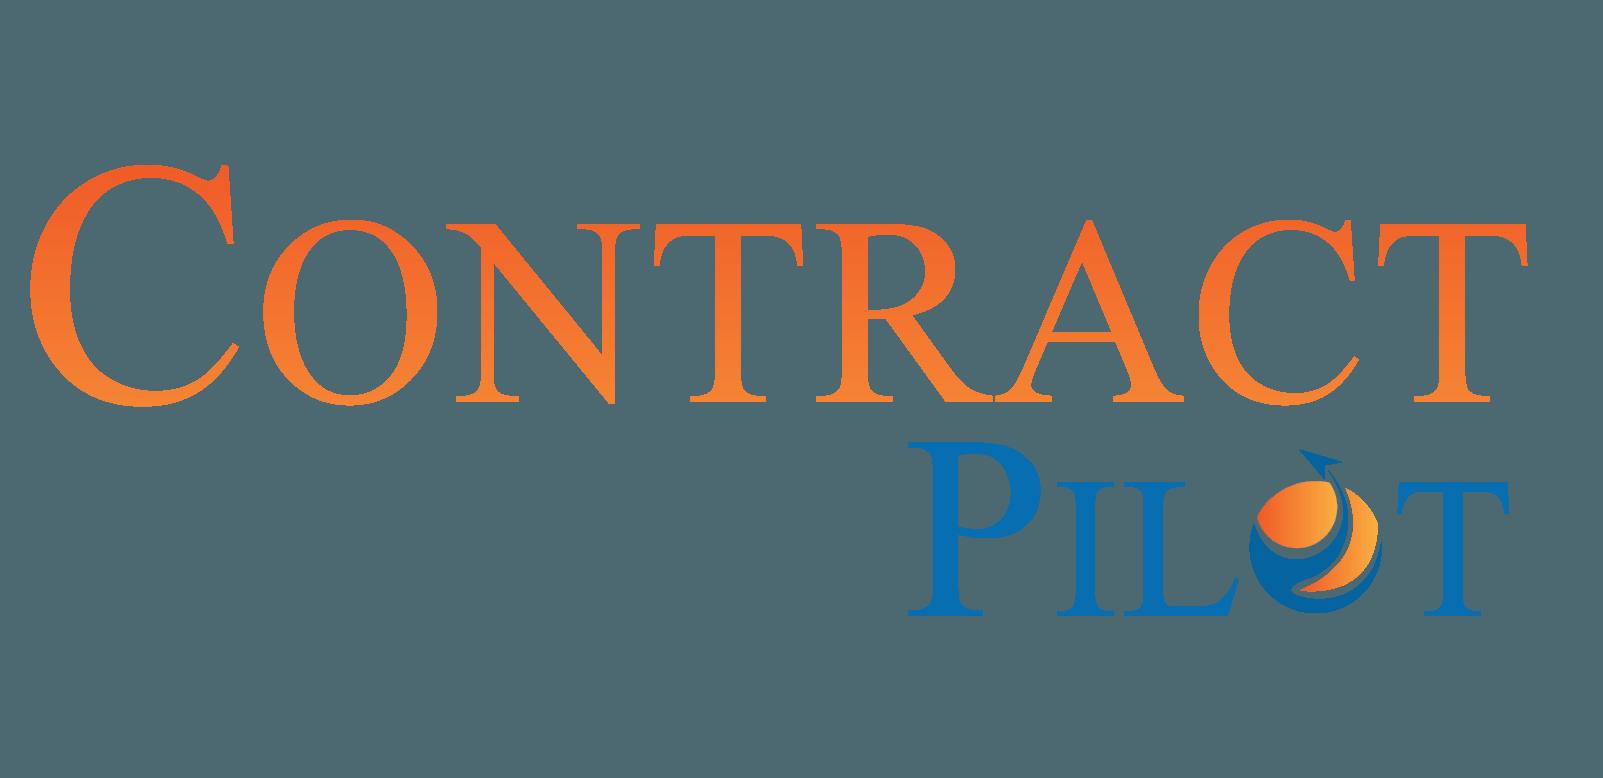 Contract Safe Pilot